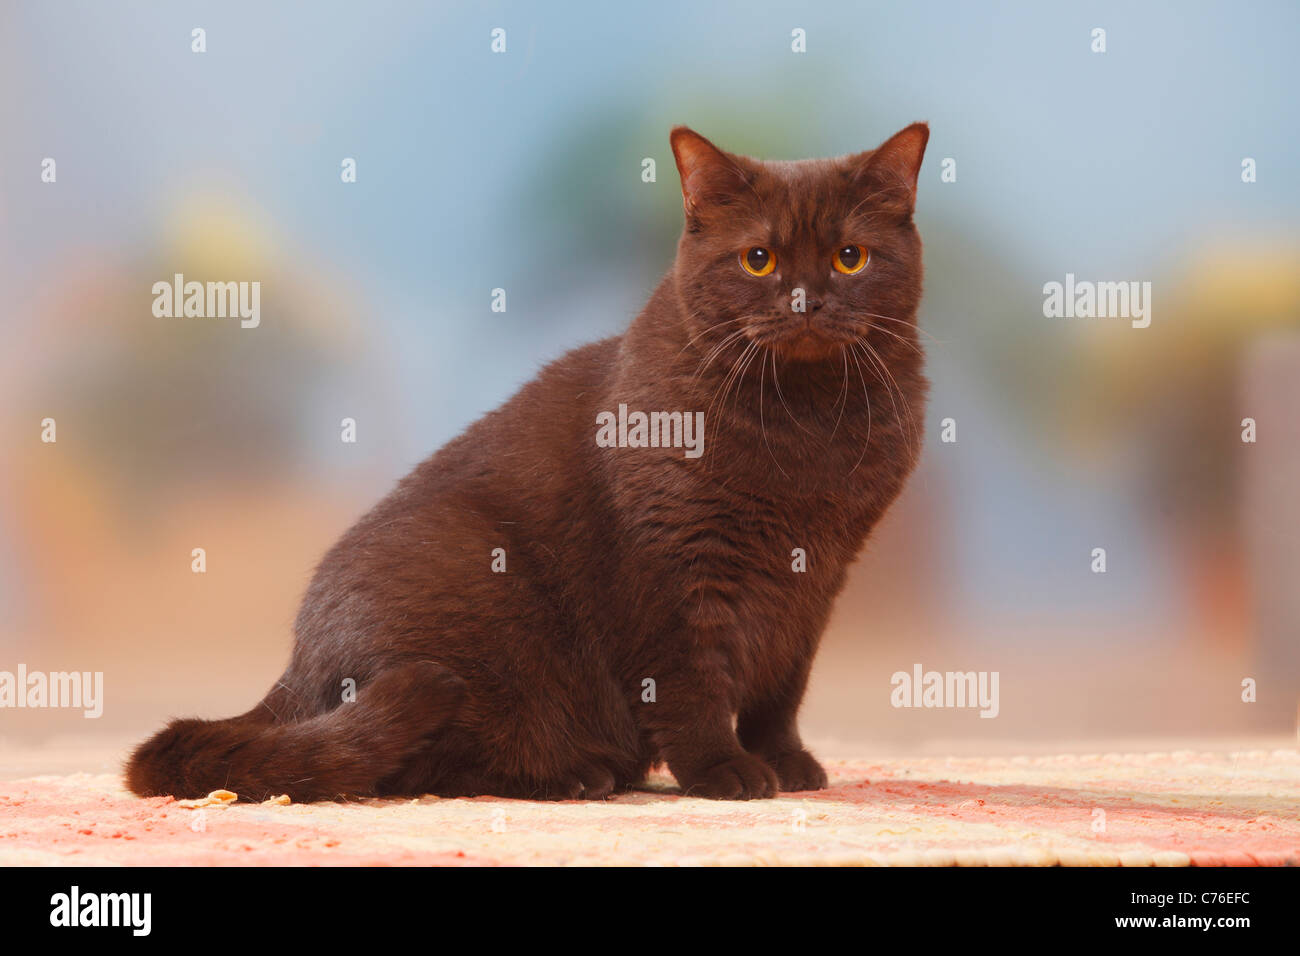 Chocolate British shorthair cat Stock Photo, Royalty Free Image ...